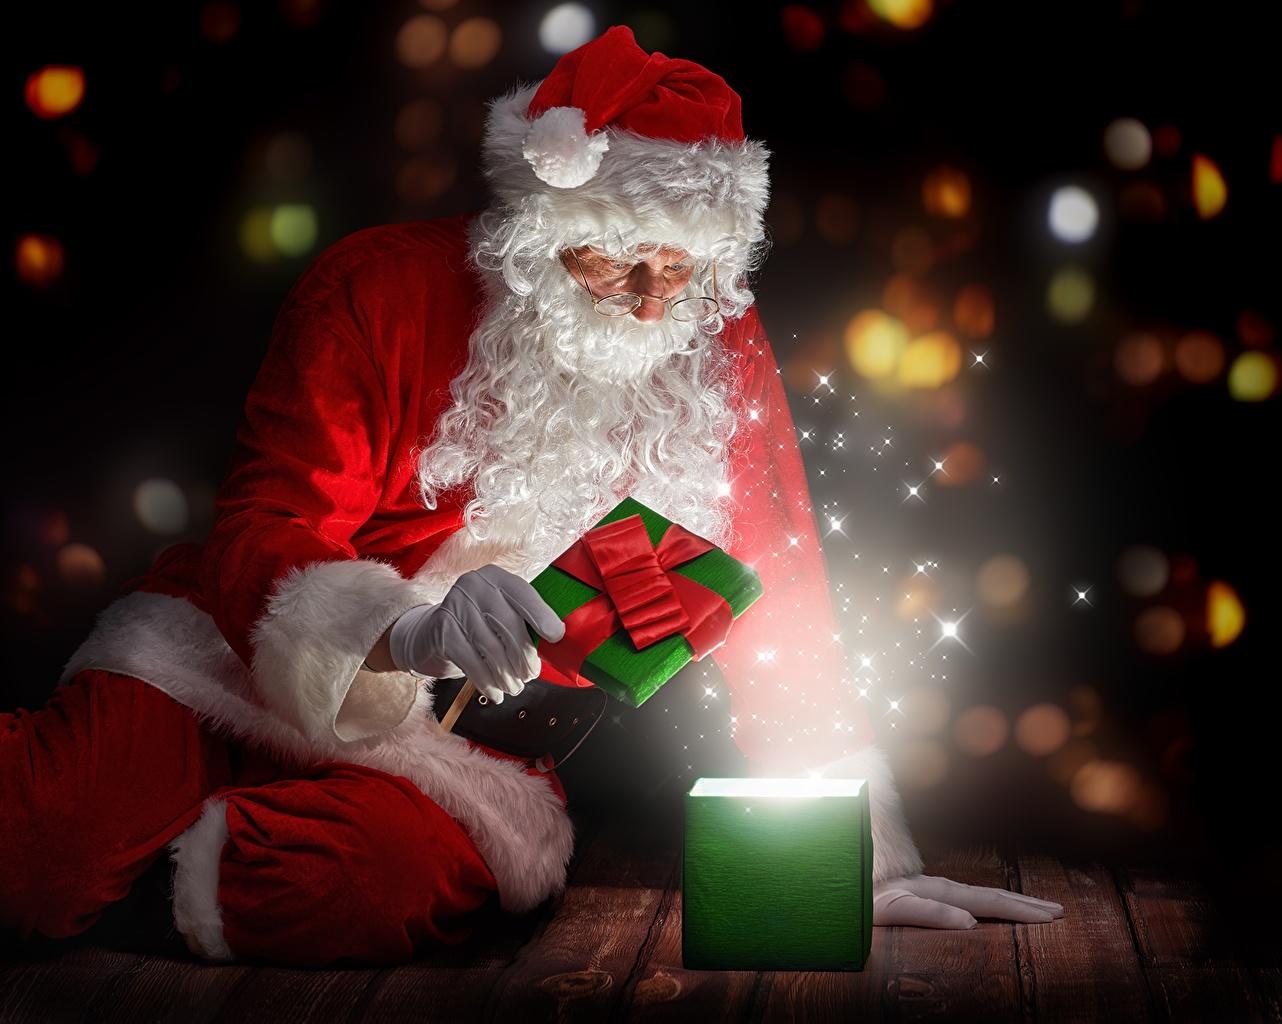 Фотография Рождество Шапки Дед Мороз Подарки Новый год Санта-Клаус